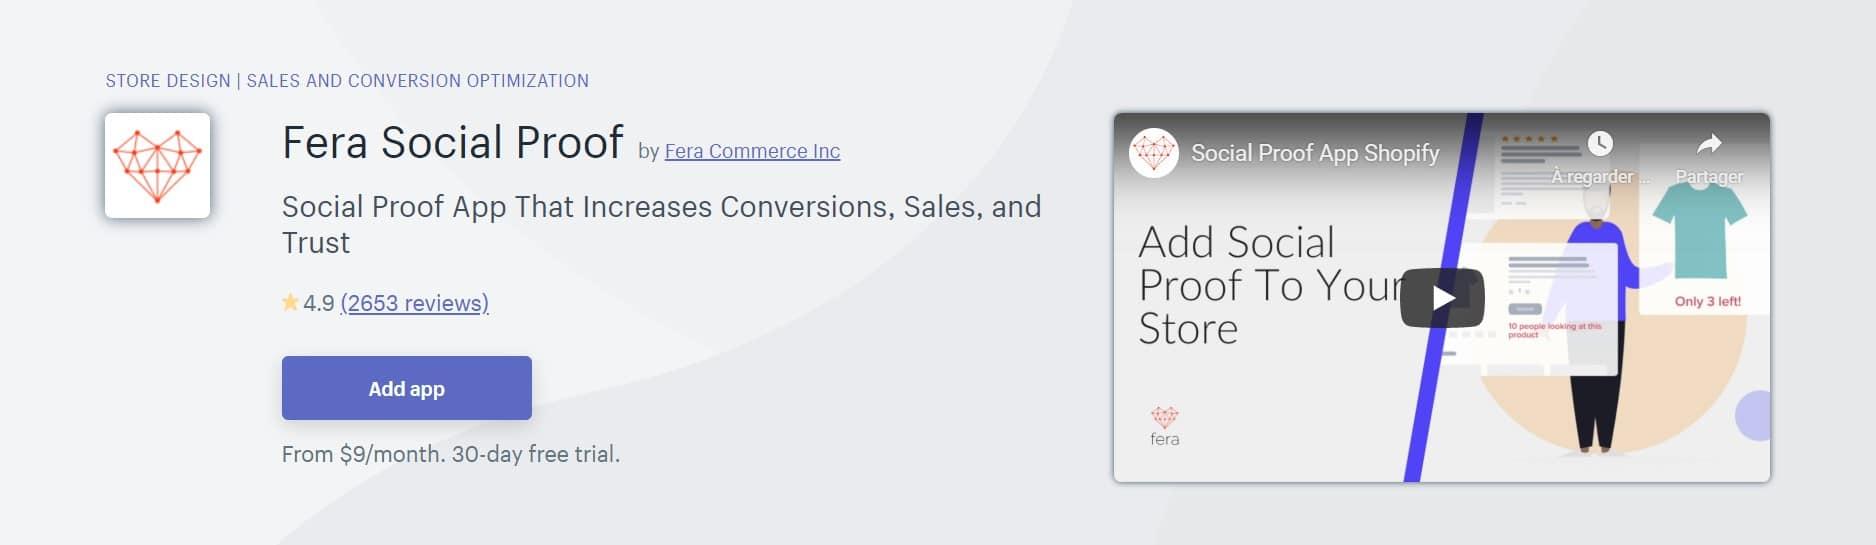 Application Shopify : Fera Social Proof